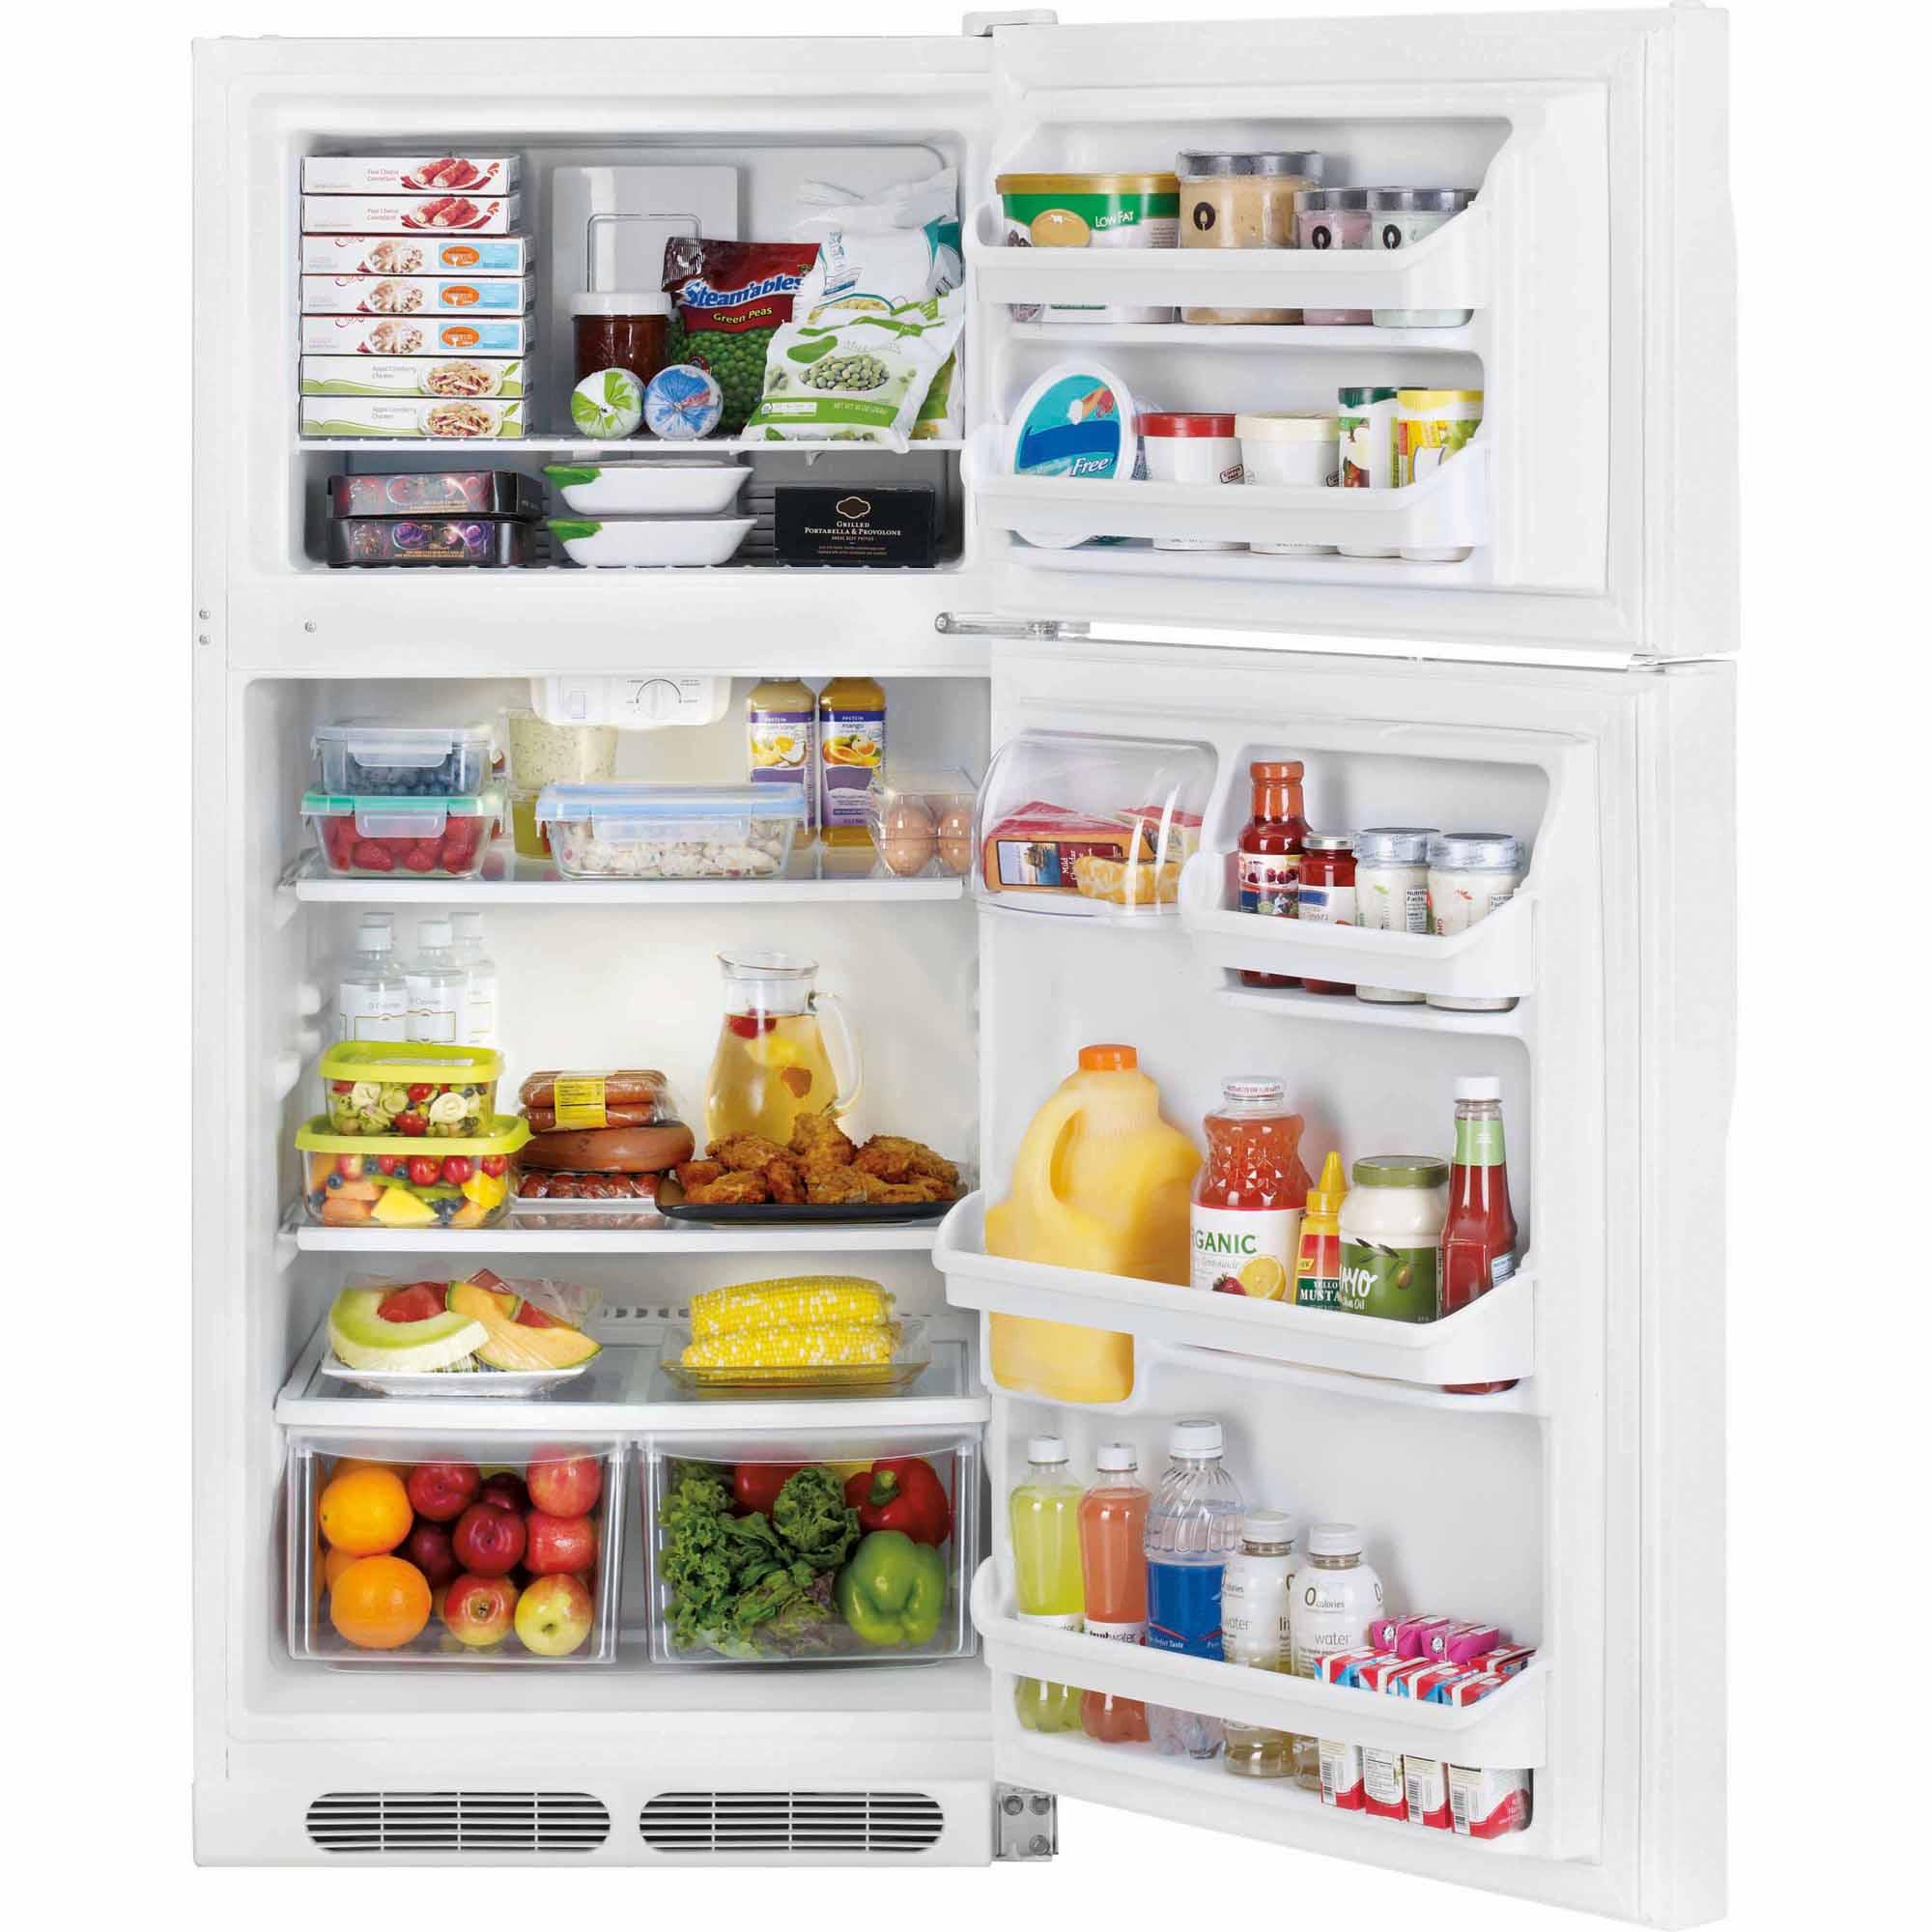 Kenmore 14.6 cu. ft. Top Mount Refrigerator - White